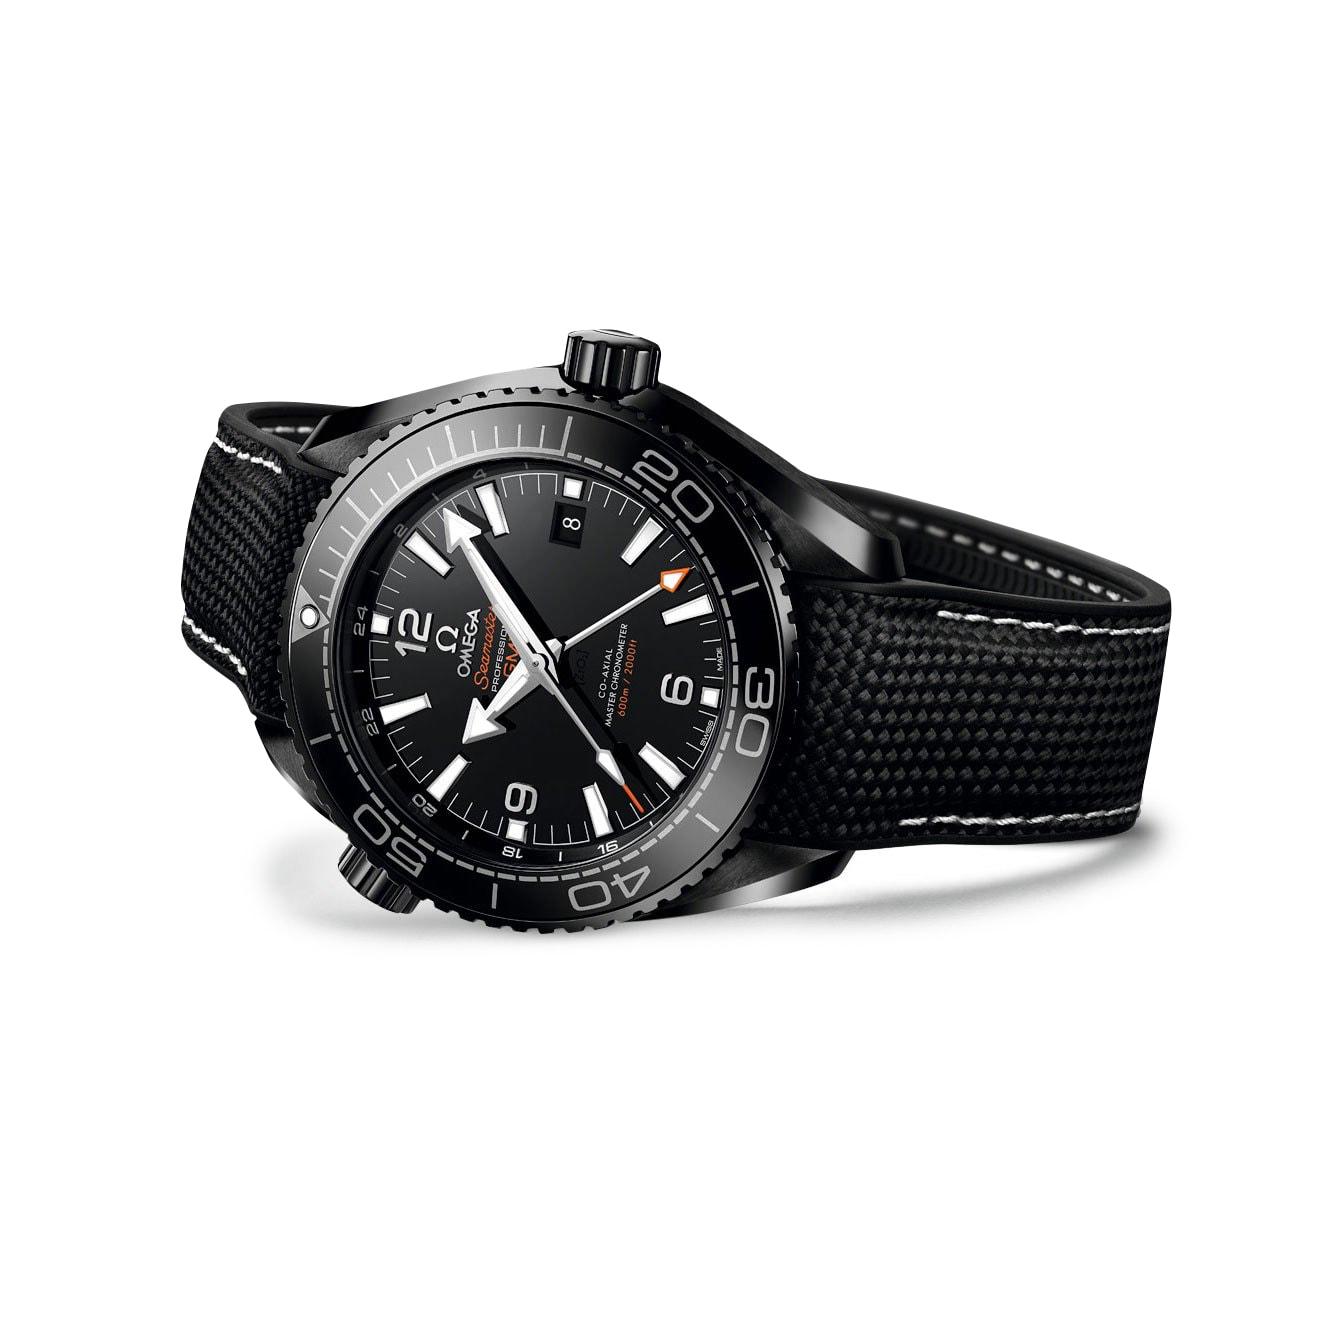 "OMEGA Seamaster Planet Ocean Master Chronometer ""Deep Black"" 600M"